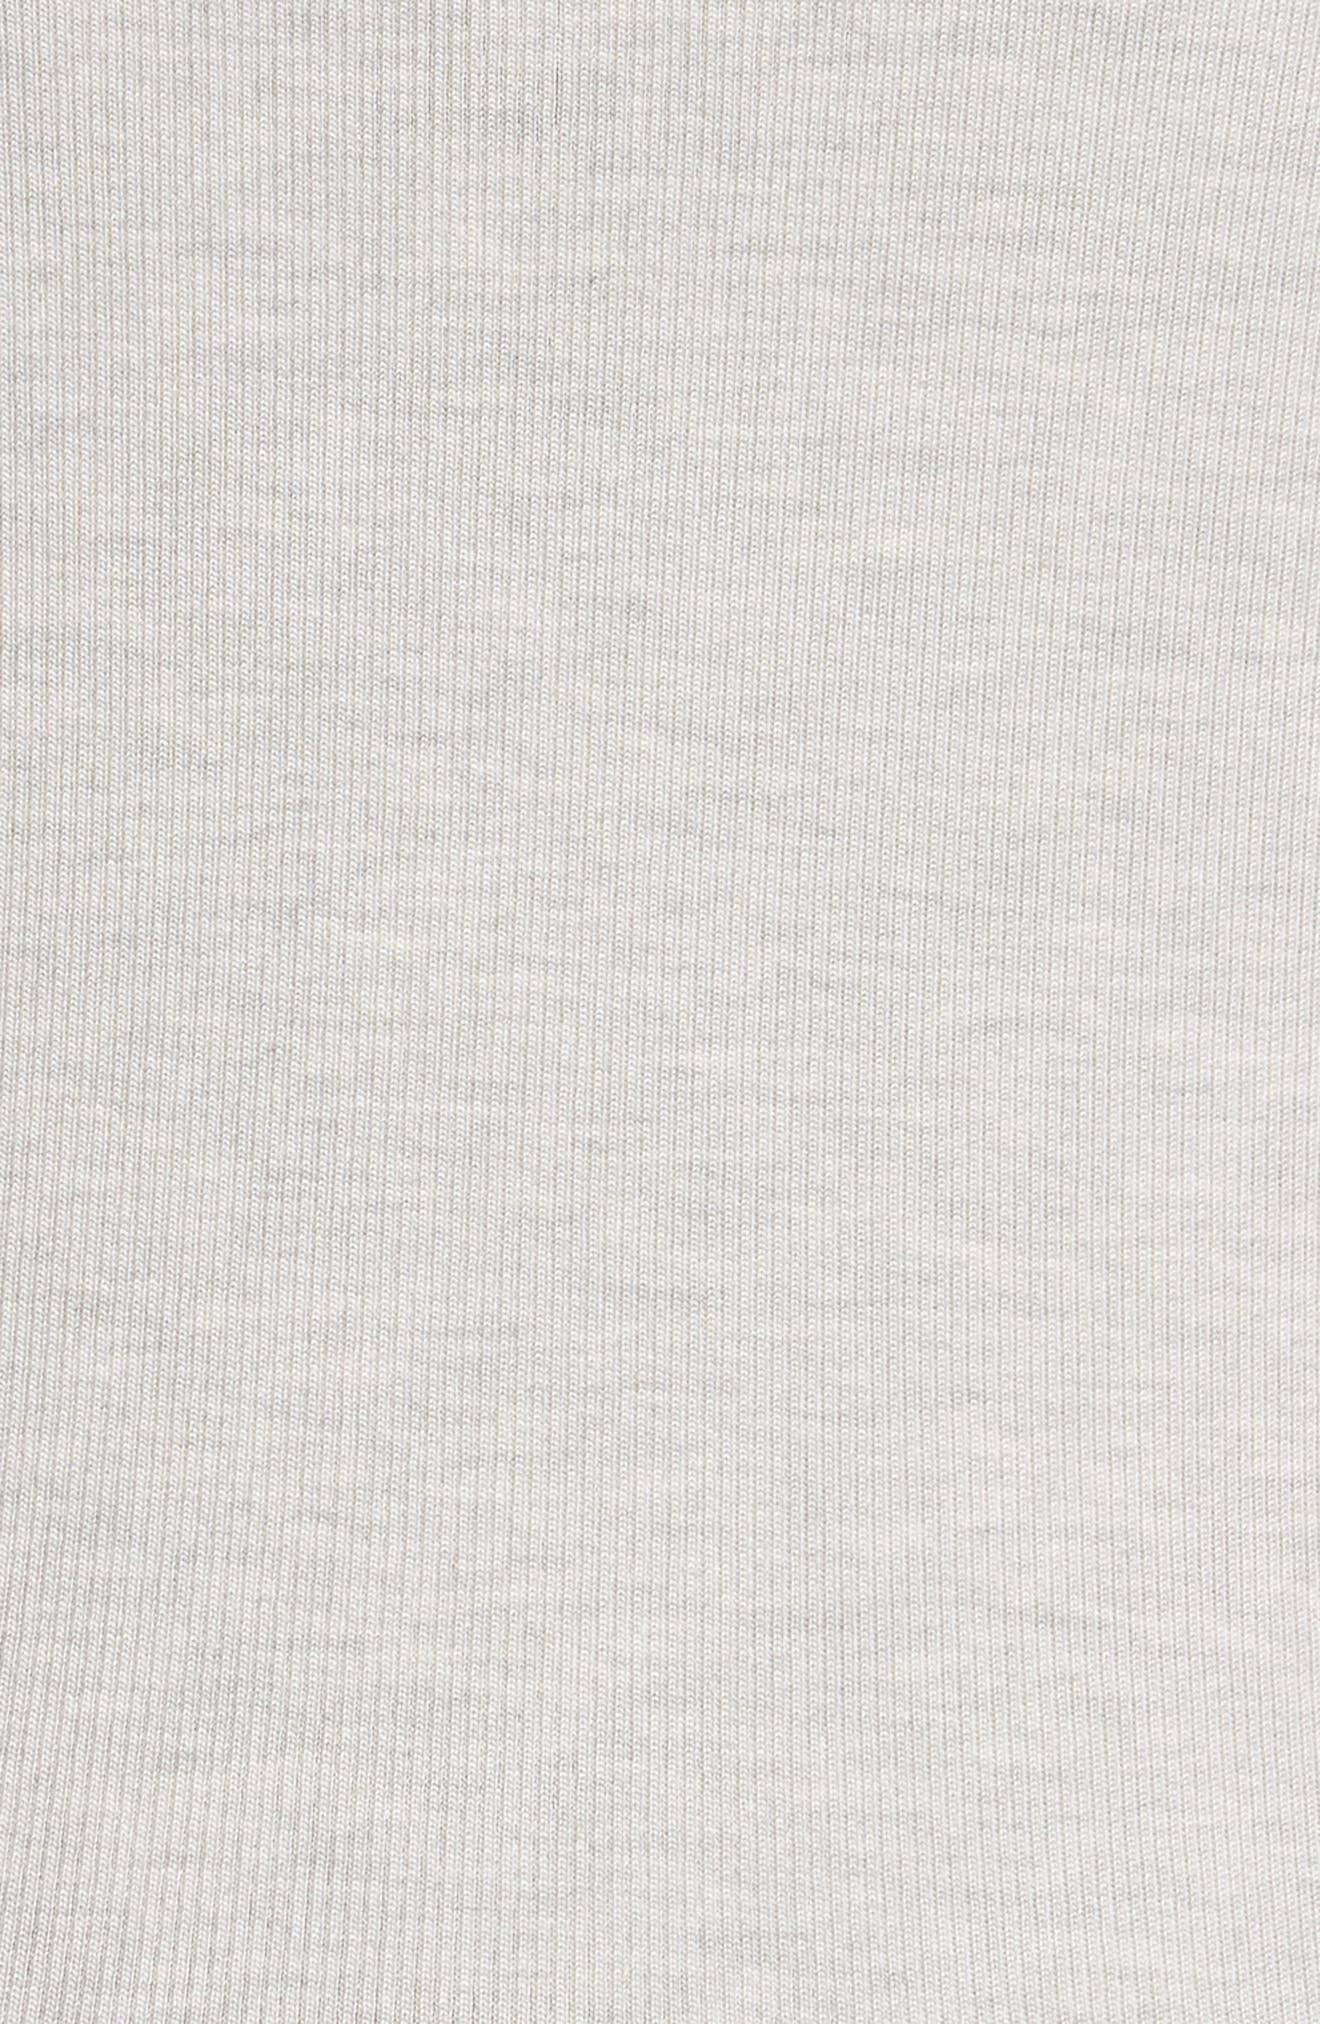 Rib Knit Silk Blend Sweater,                             Alternate thumbnail 5, color,                             Pebble Melange